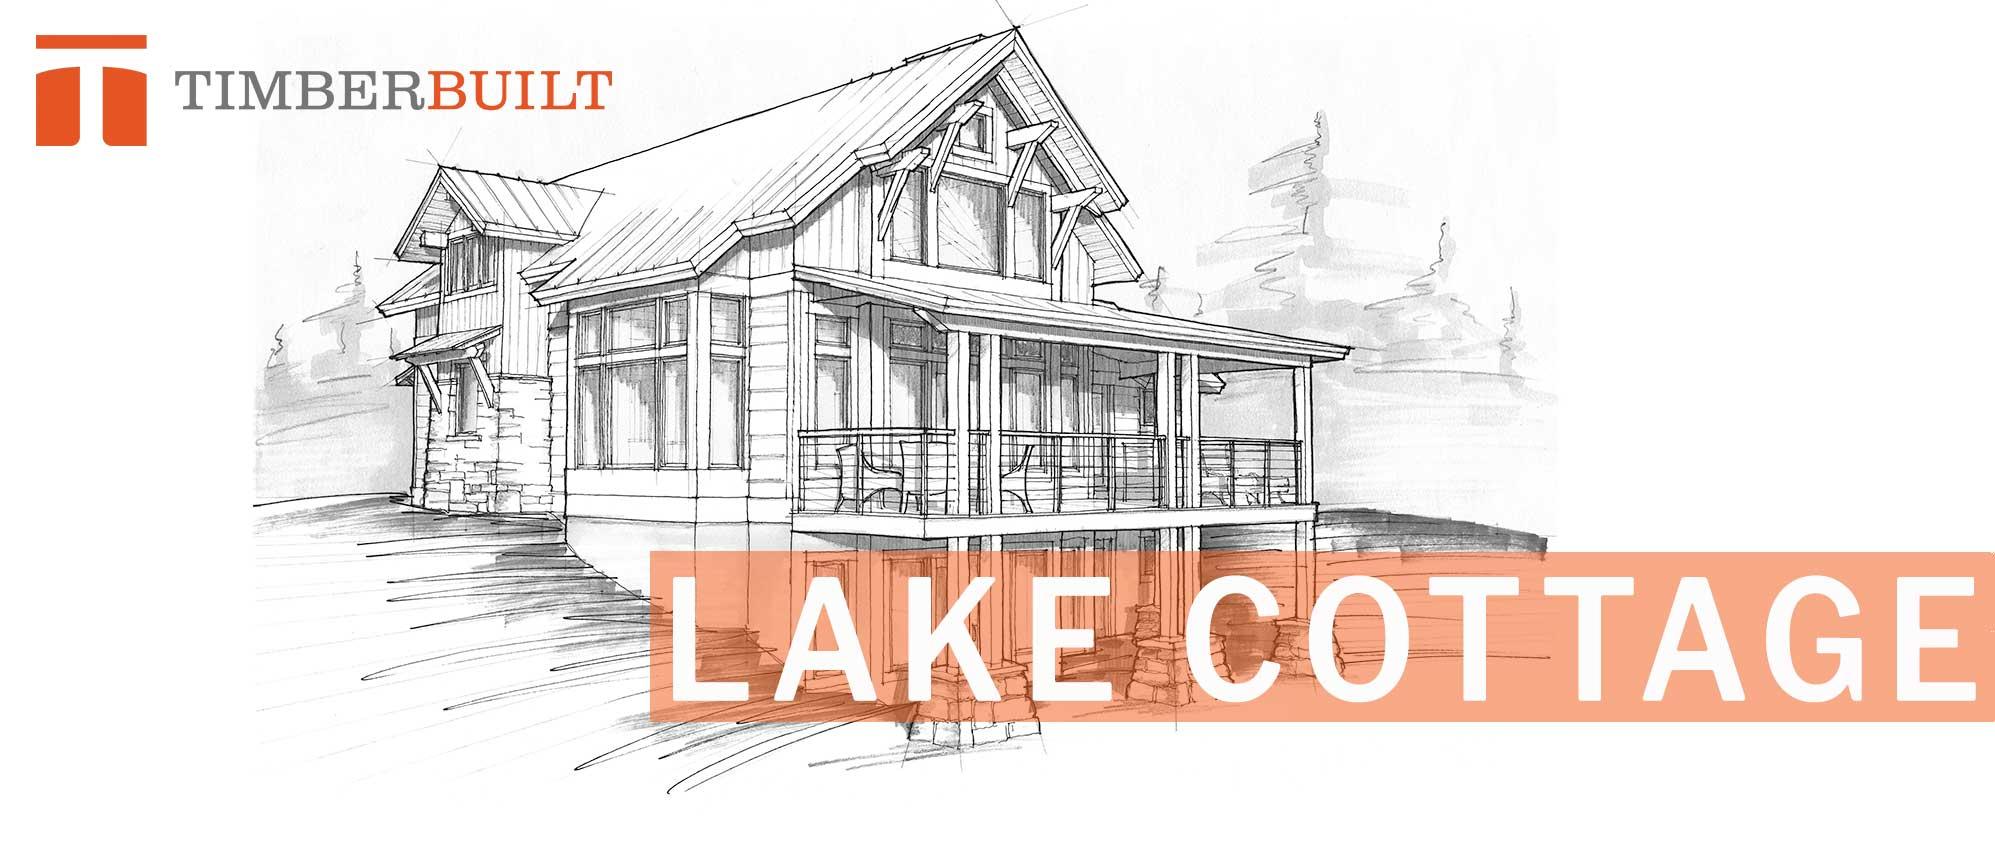 Lake Cottage | Timber Frame Home Designs | Timberbuilt